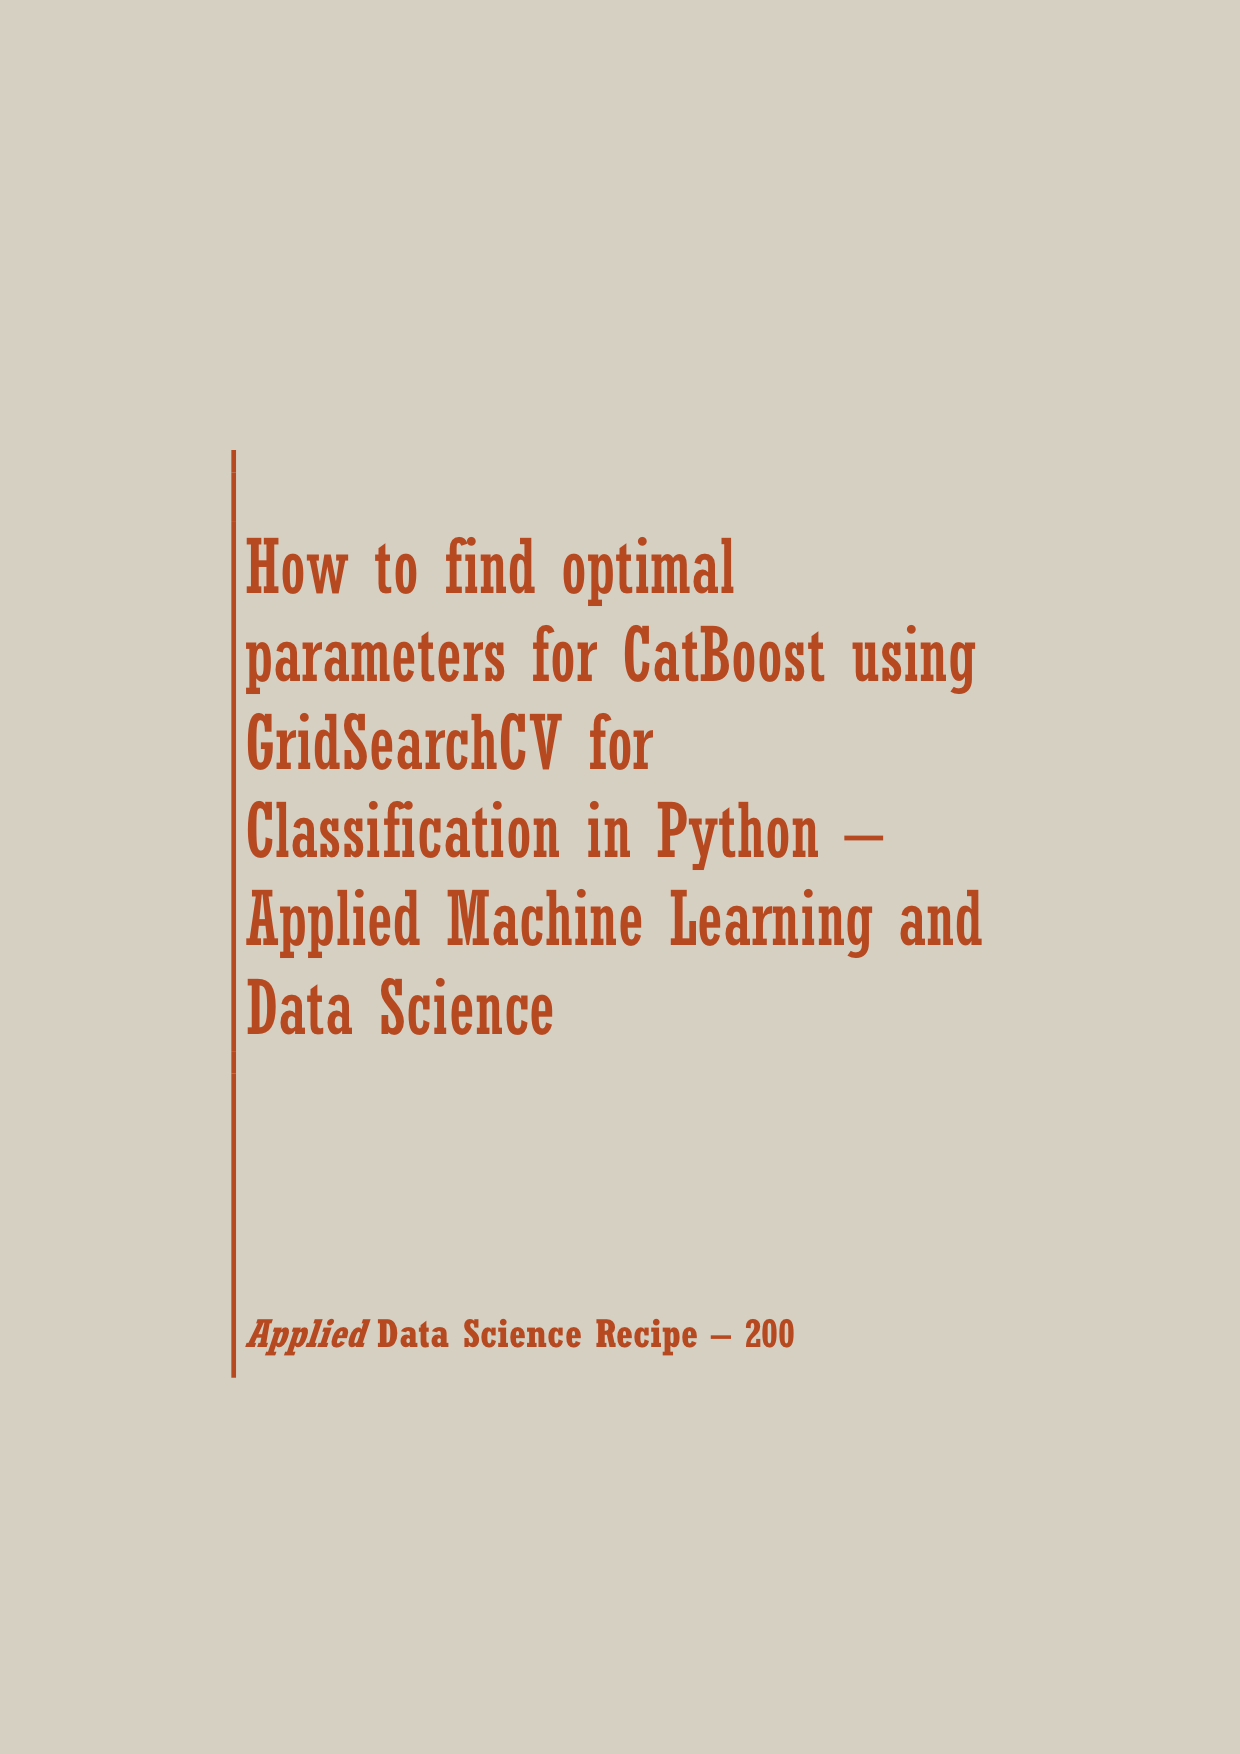 find optimal parameters for CatBoost using GridSearchCV for